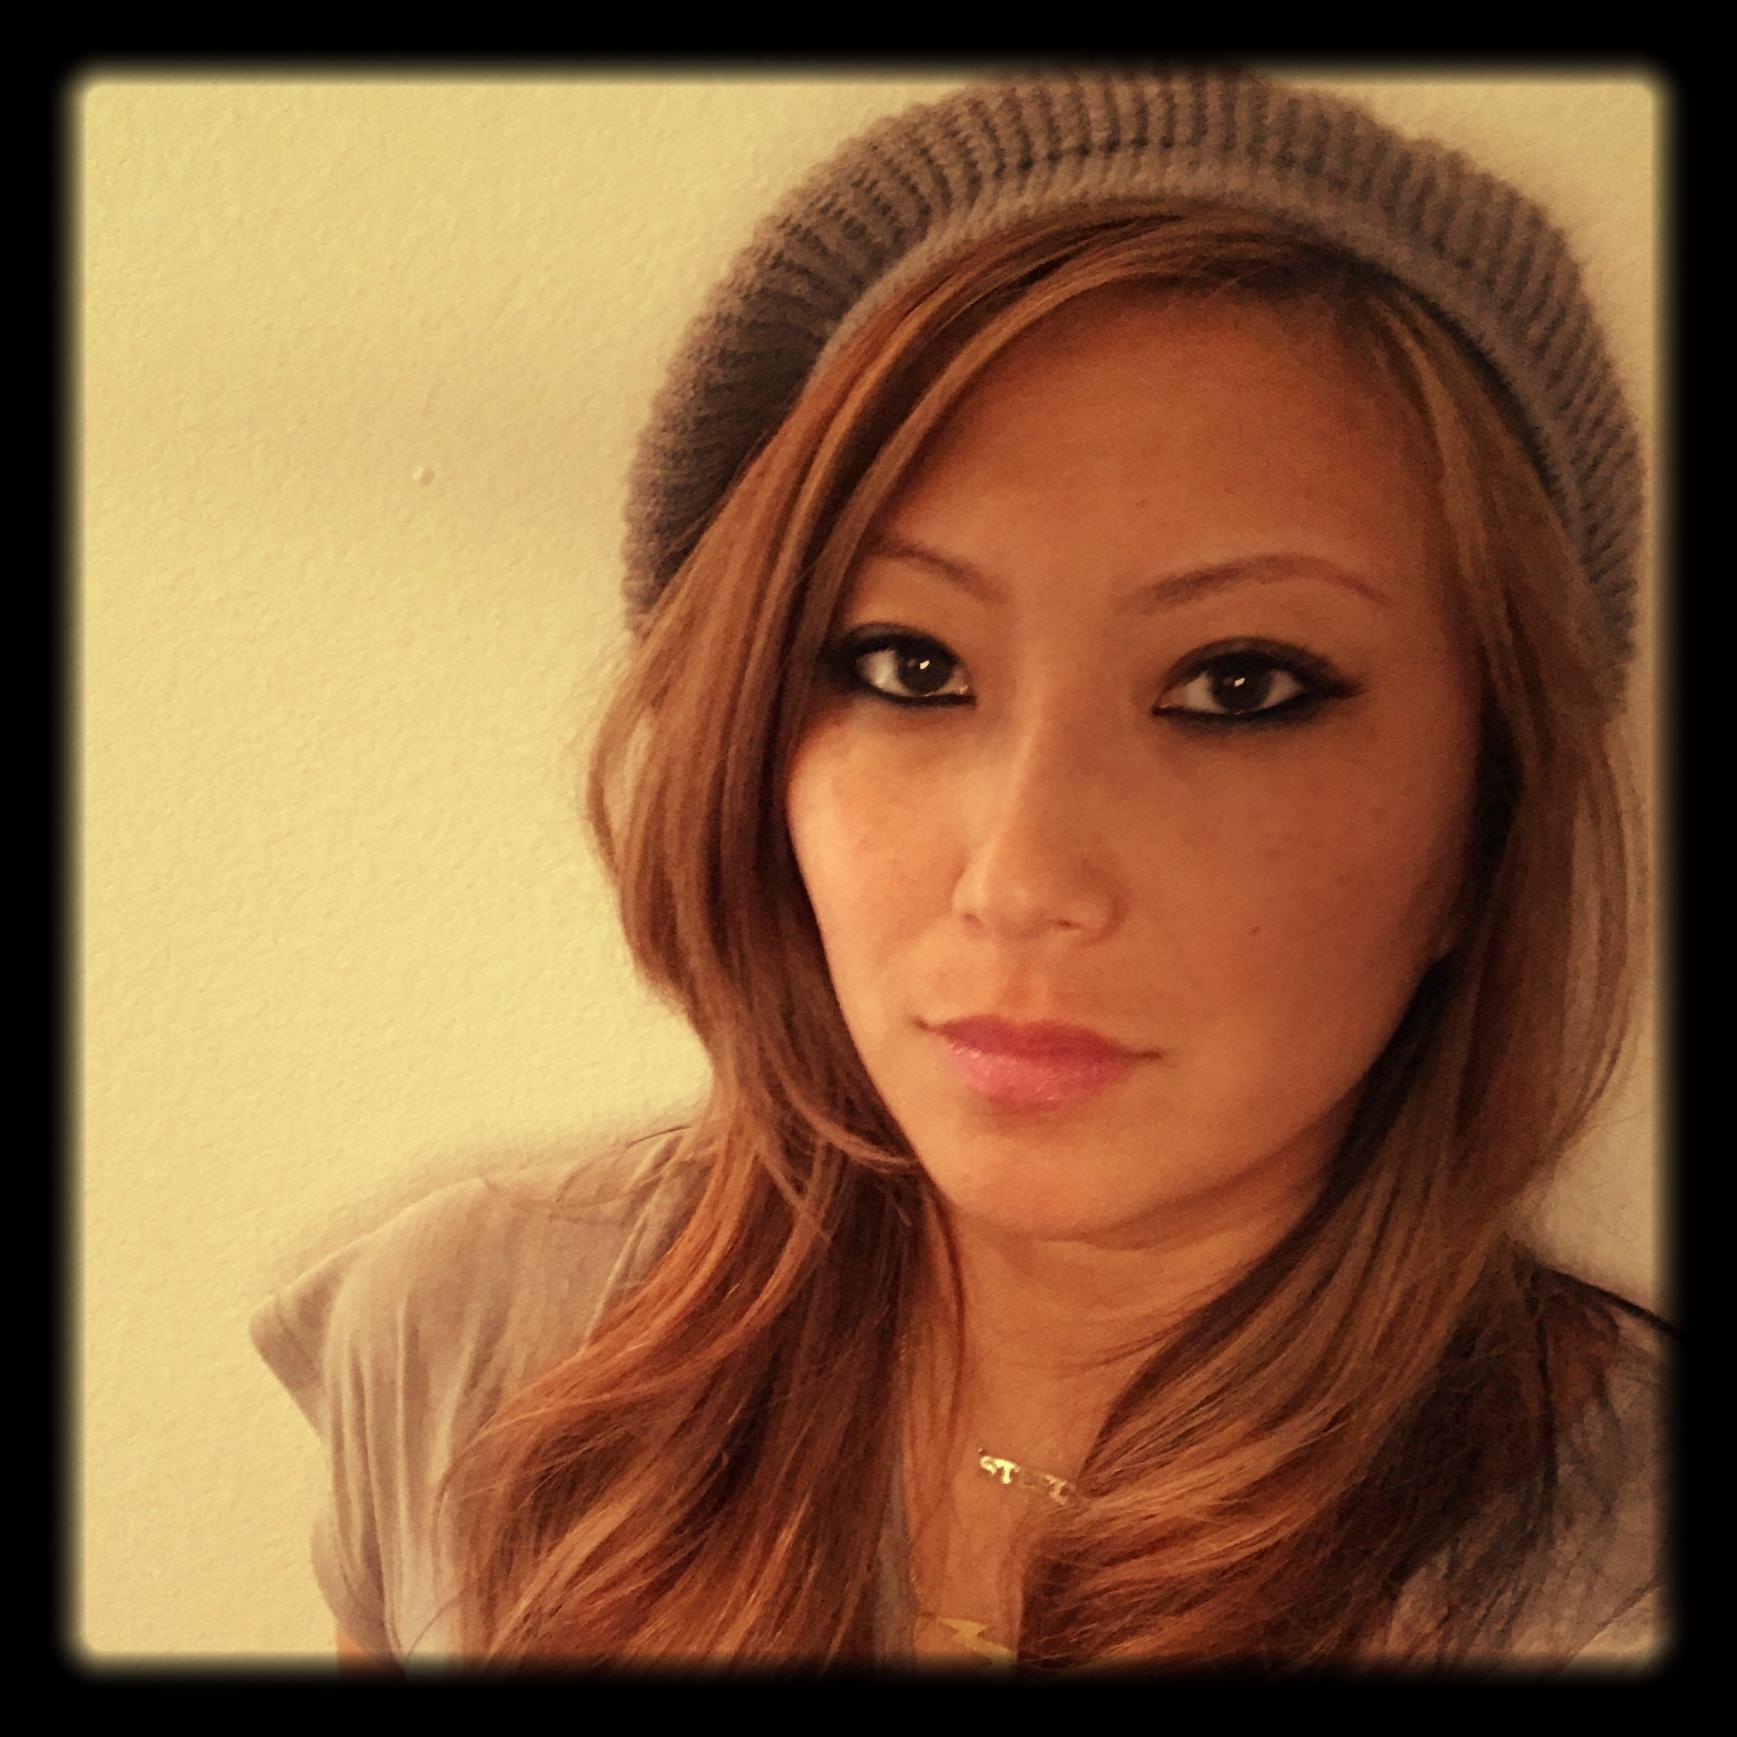 stefeni_jung_headshot.jpg